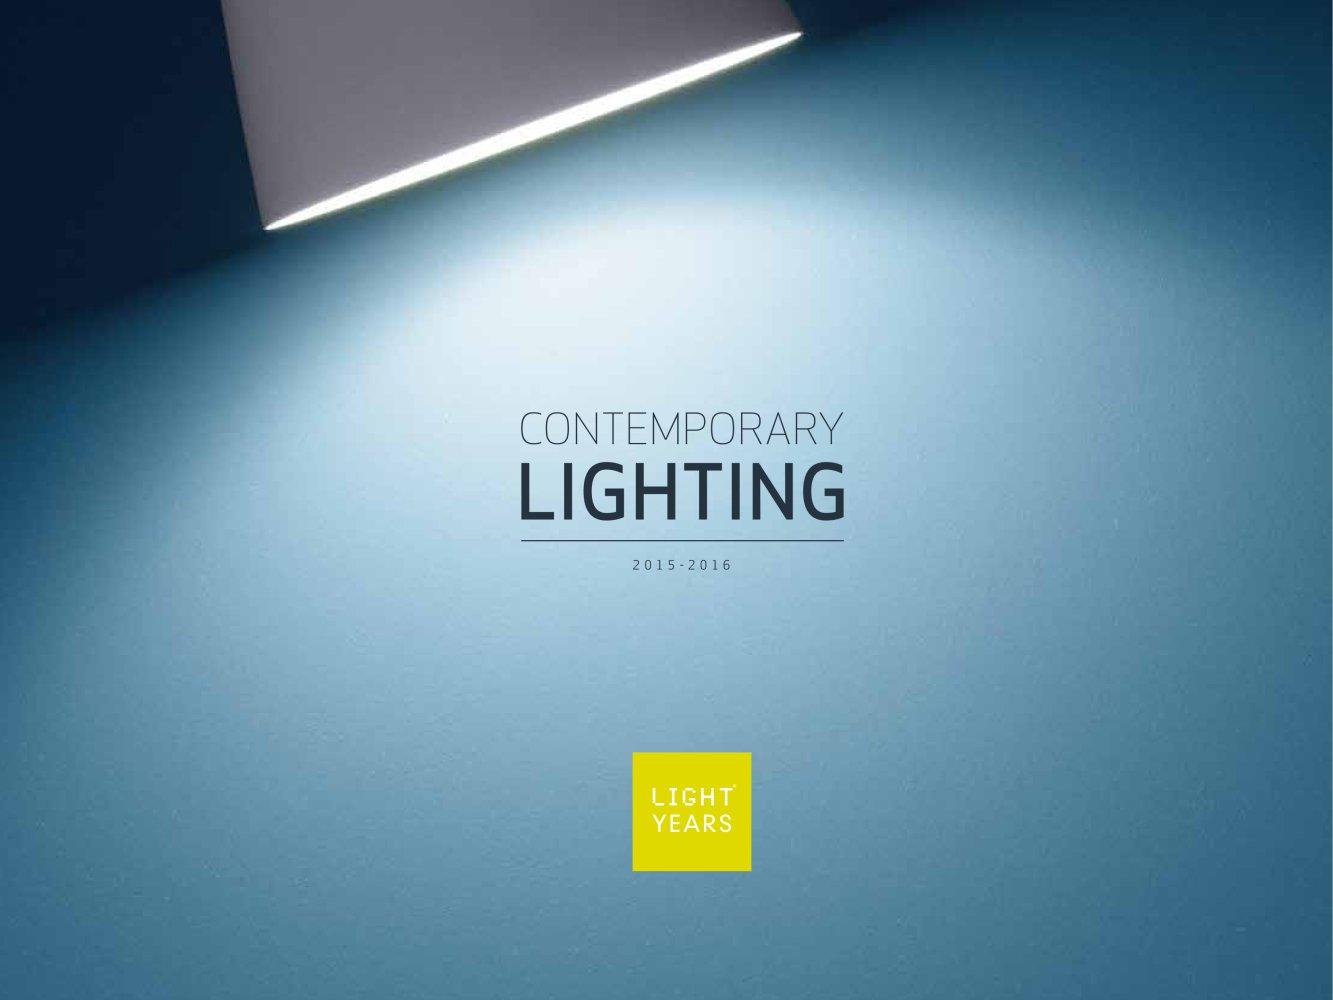 Lightyears Calabash 6 : Lightyears lightyears pdf catalogs documentation